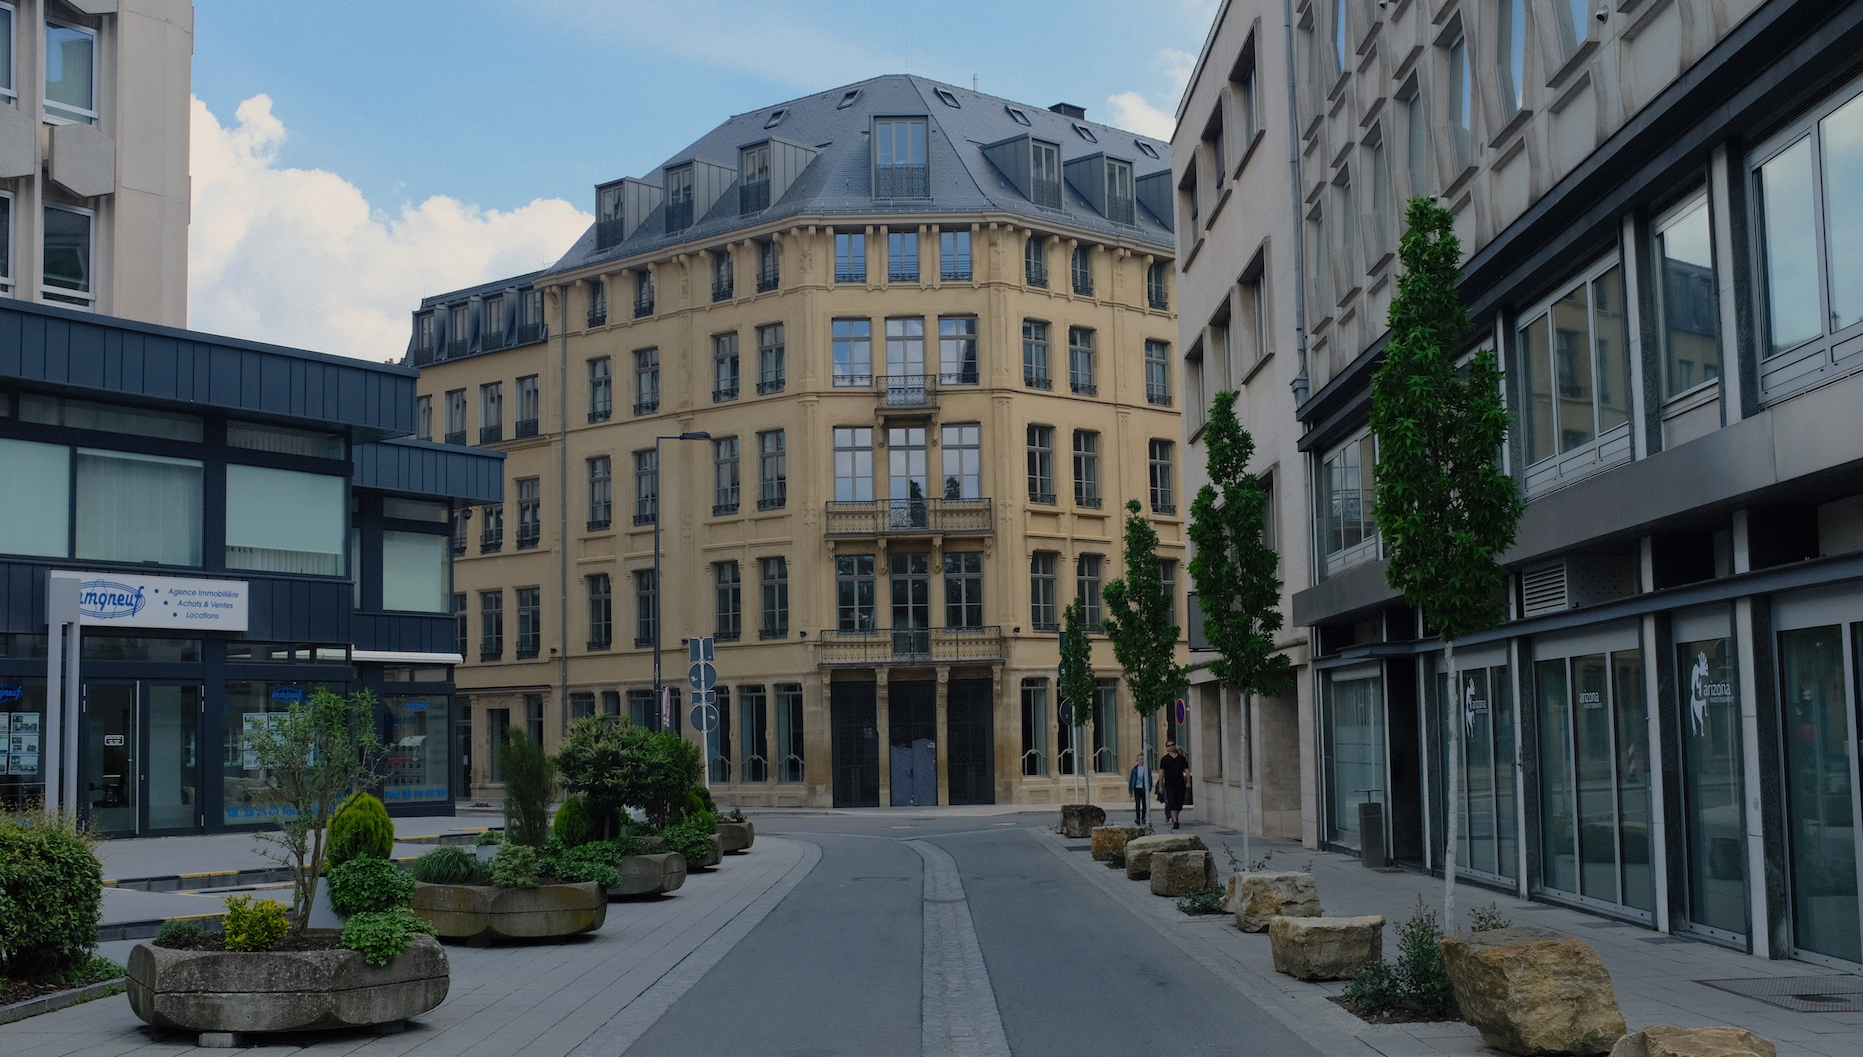 Neue Schlossherren im Stadtzentrum - REPORTER